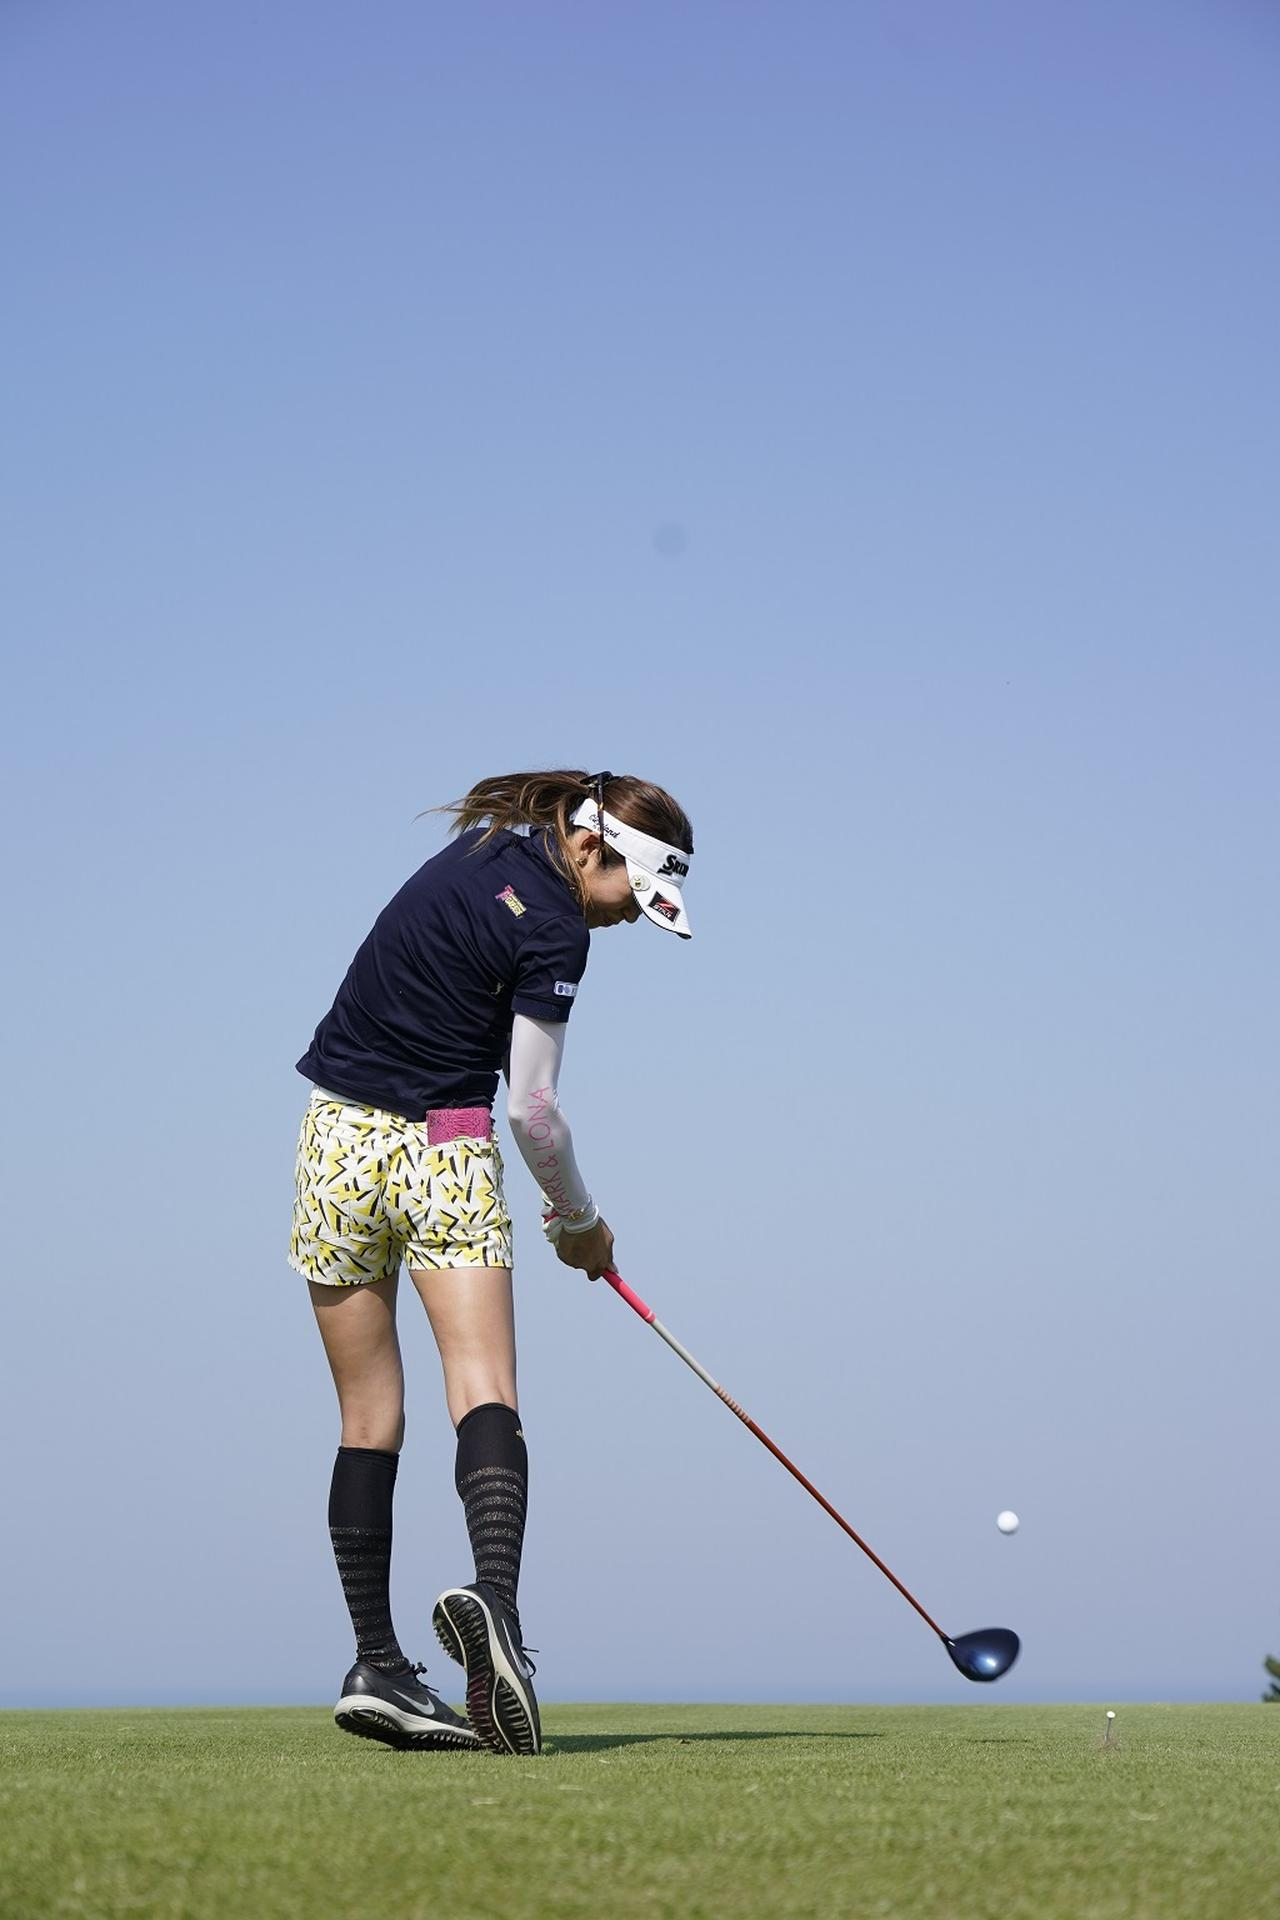 Images : 9番目の画像 - 金田久美子ドライバー後方連続写真 - みんなのゴルフダイジェスト